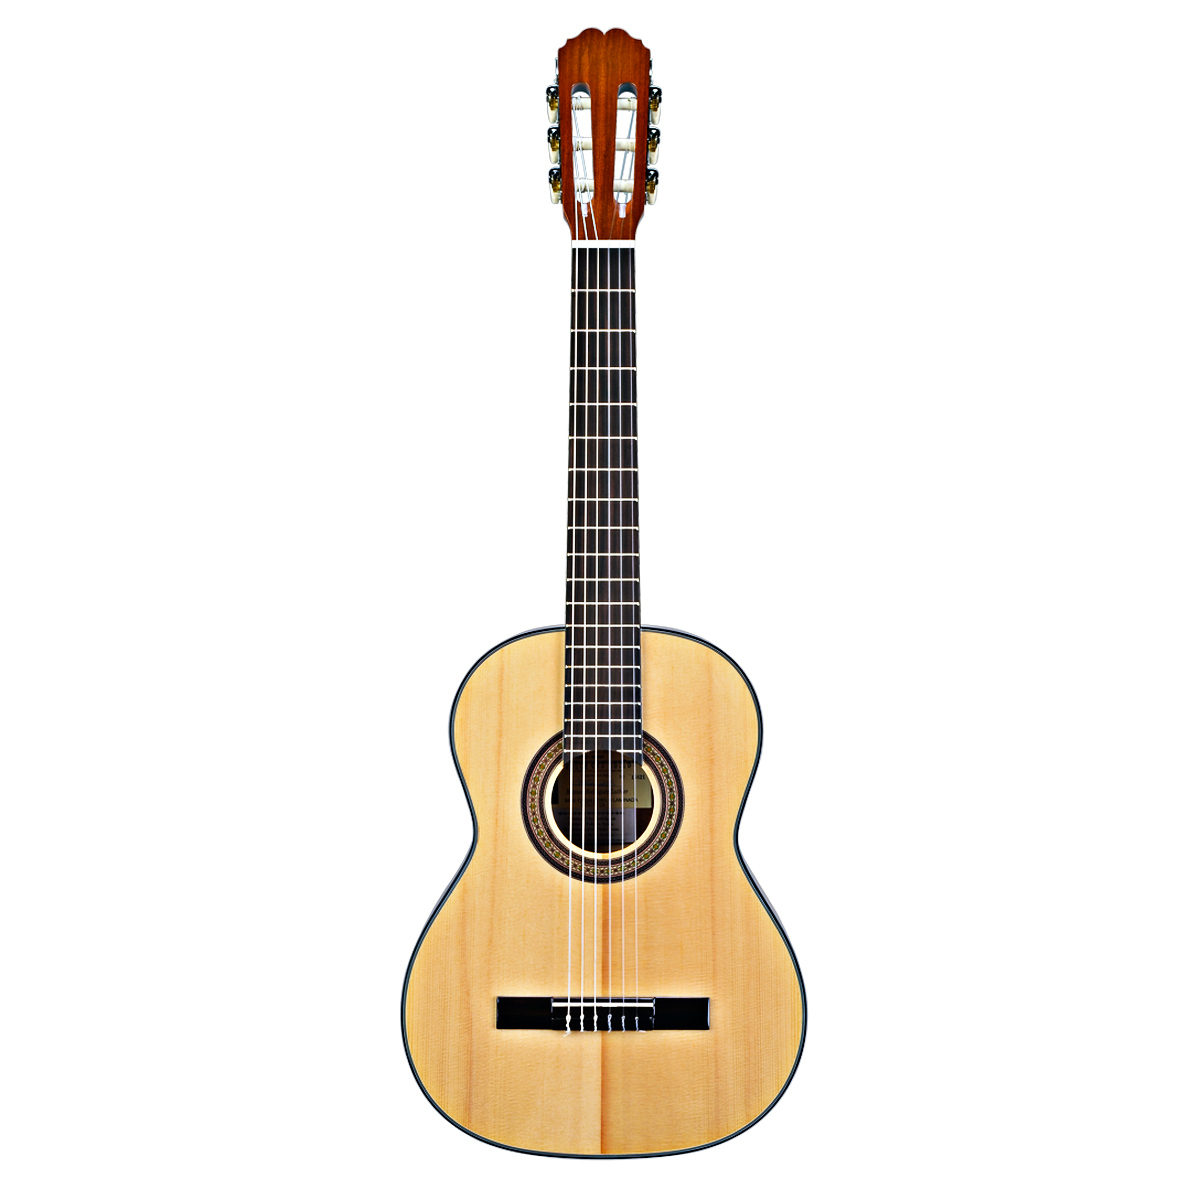 Manuel Rodriguez Caballero 8 Senorita 78 Guitar Buy Online